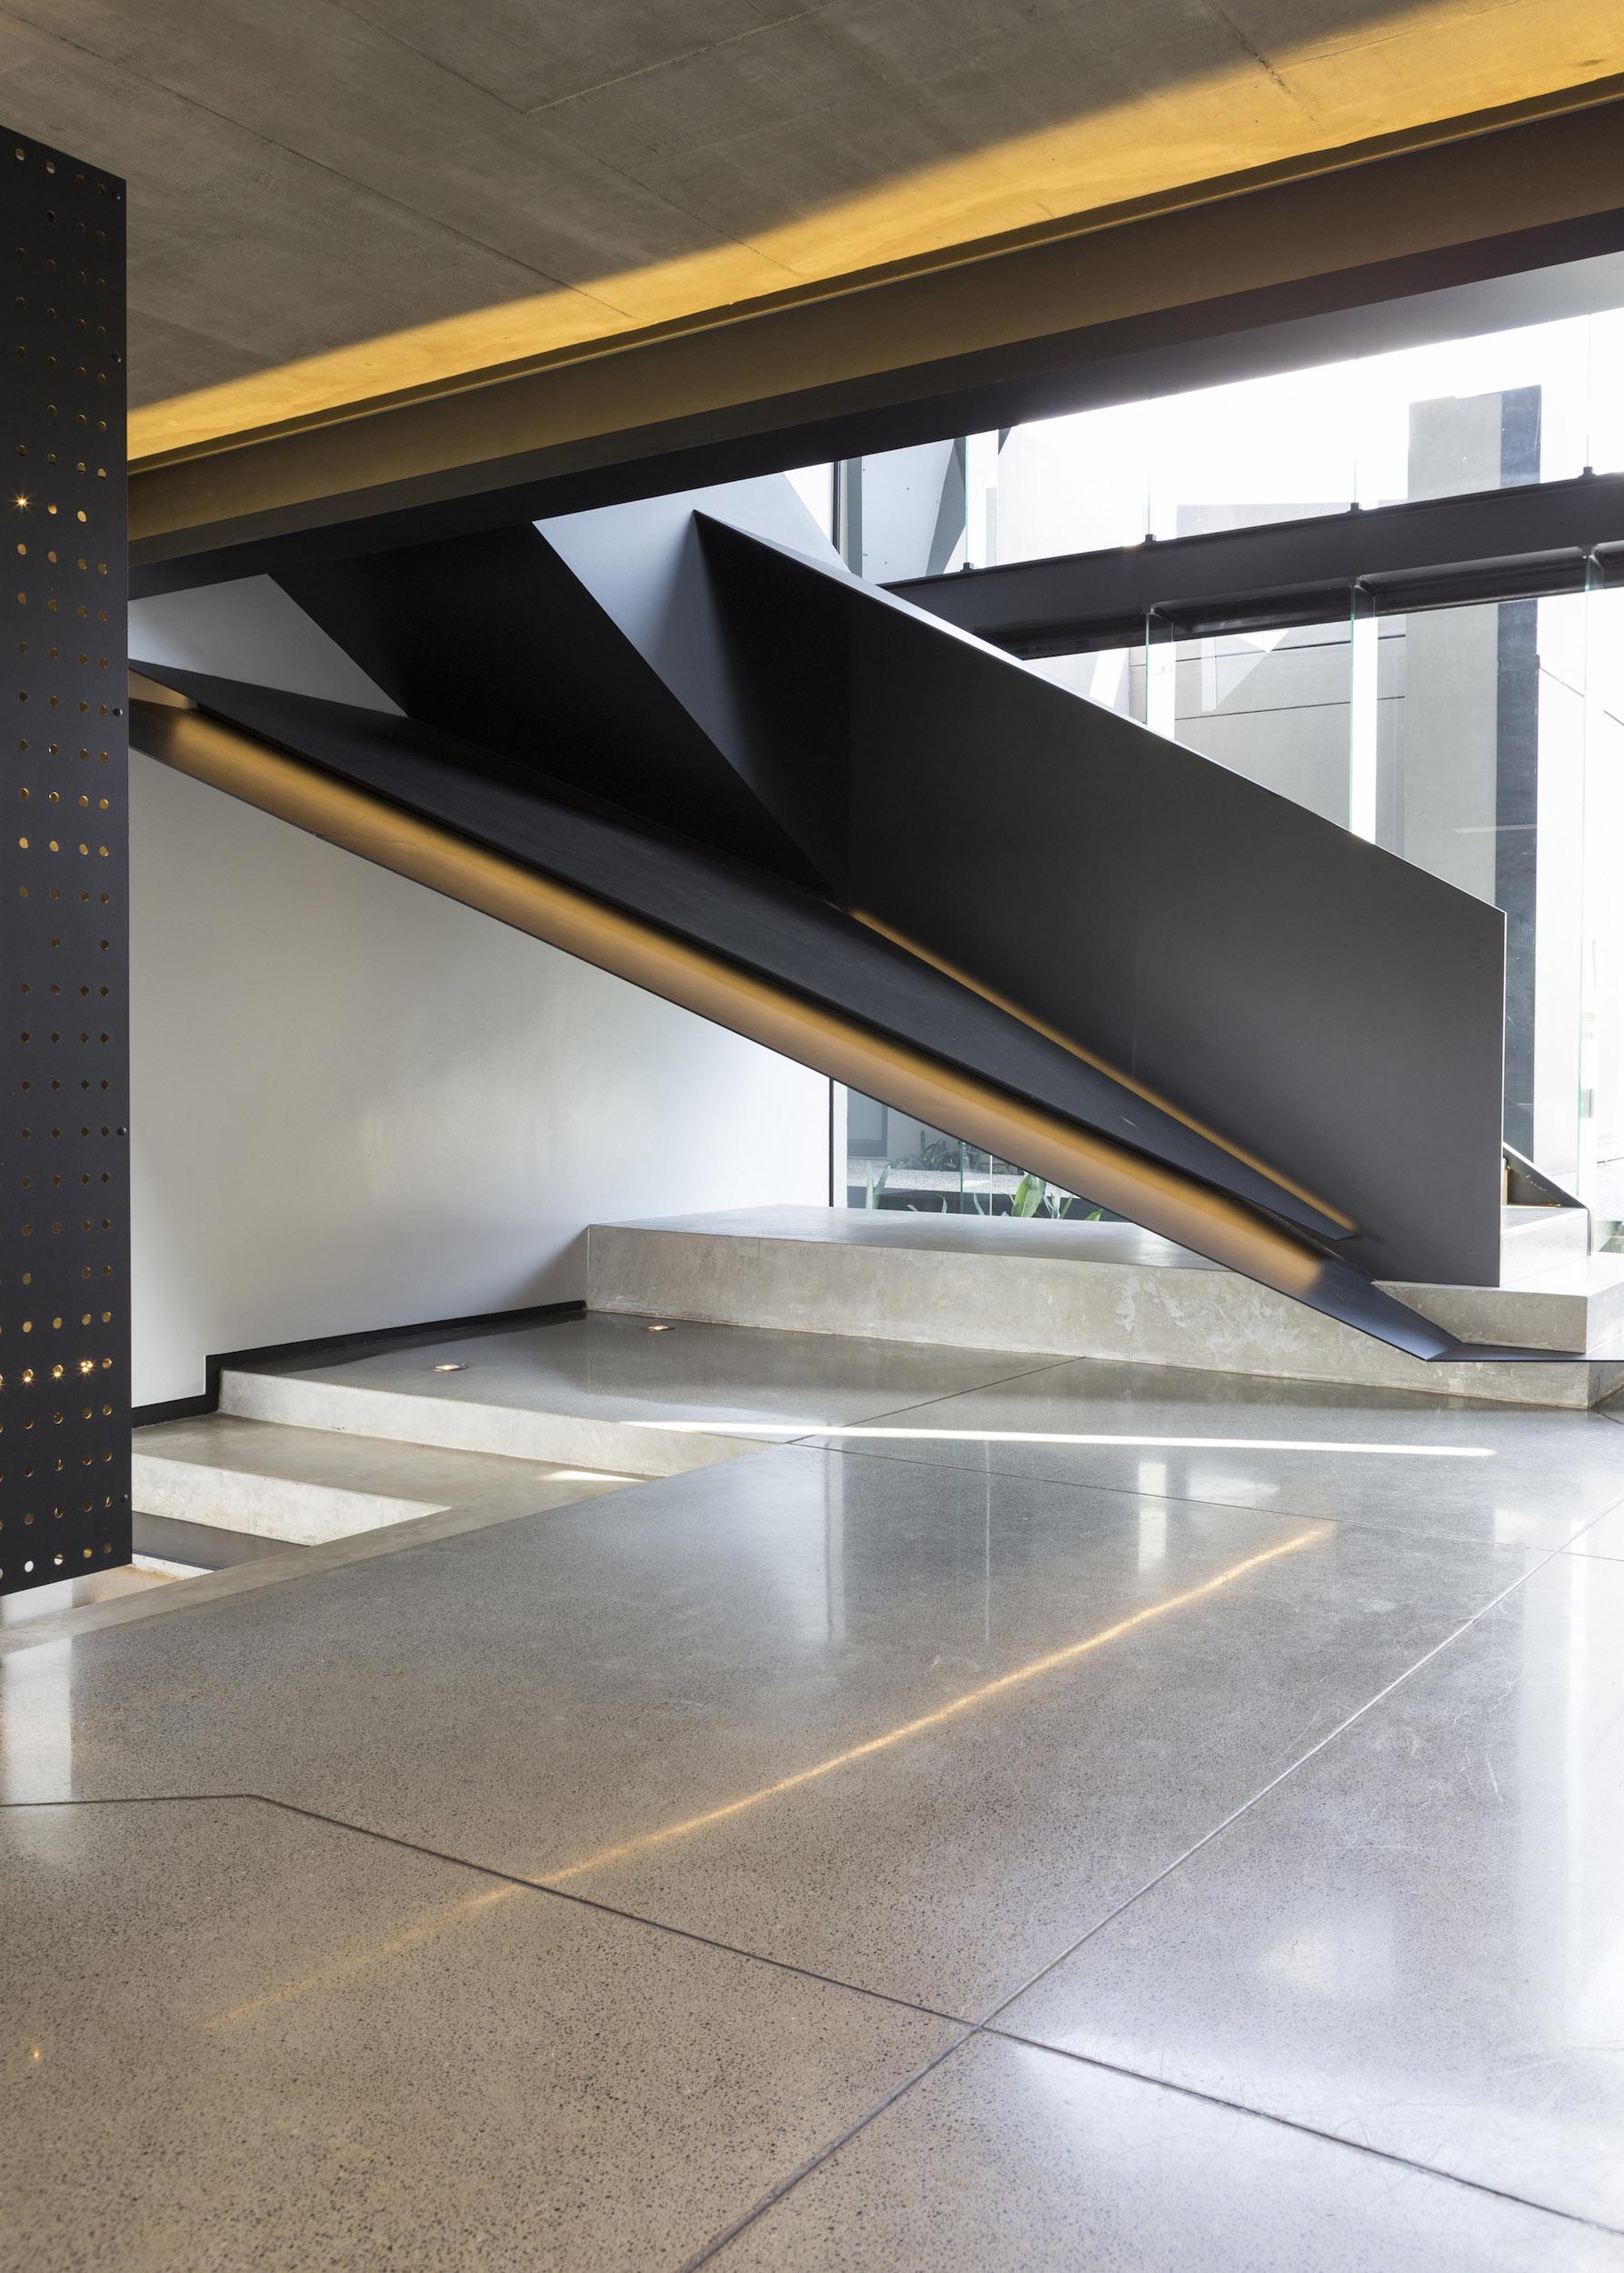 Kloof Road Masterpiece House in Johannesburg by Nico van der Meulen Architects-04